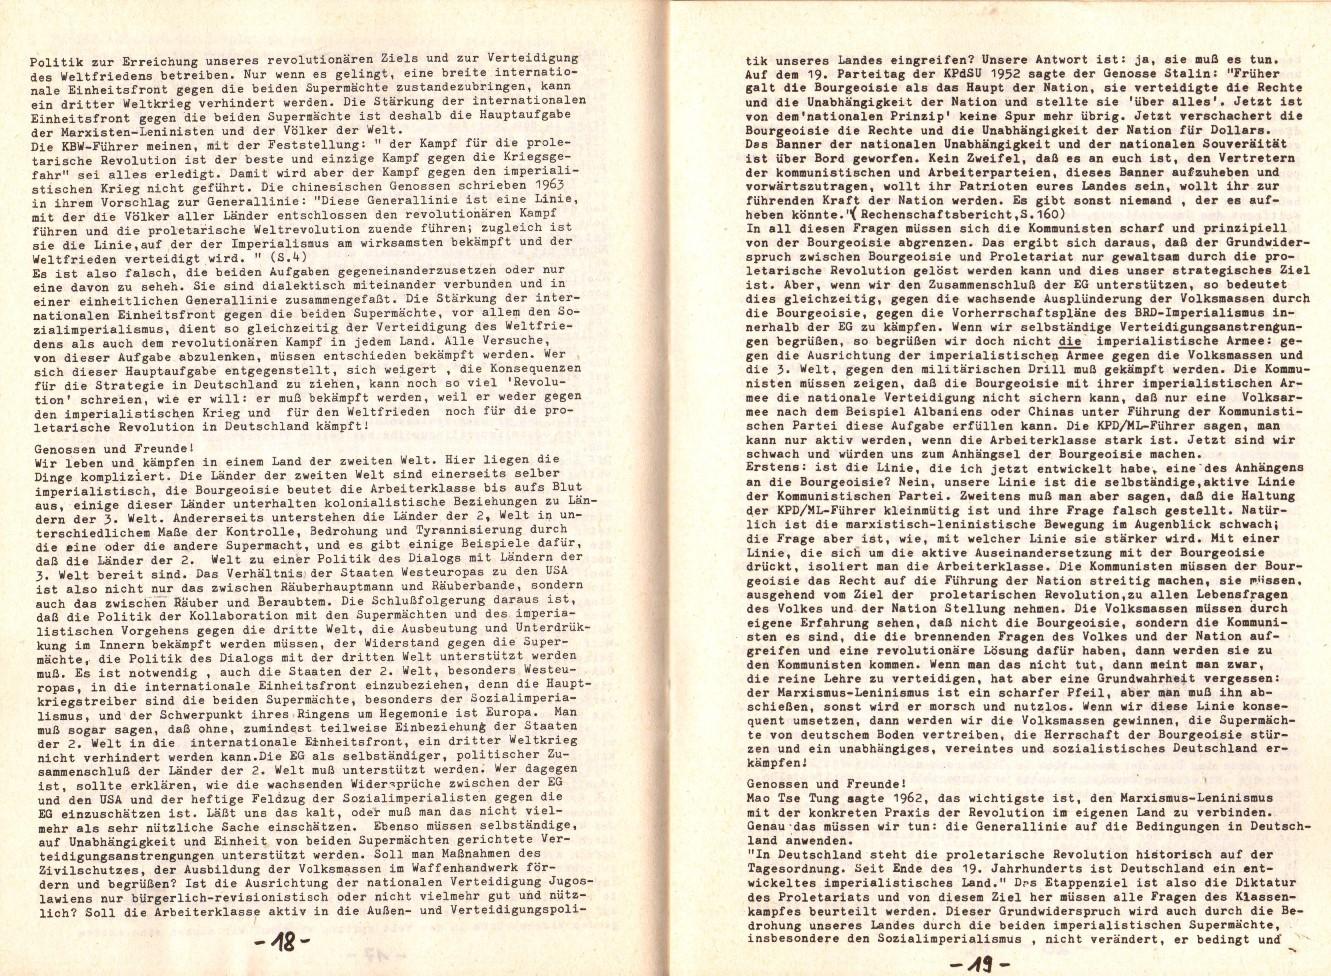 Berlin_AO_1976_Veranstaltung_mit_KPDML_10